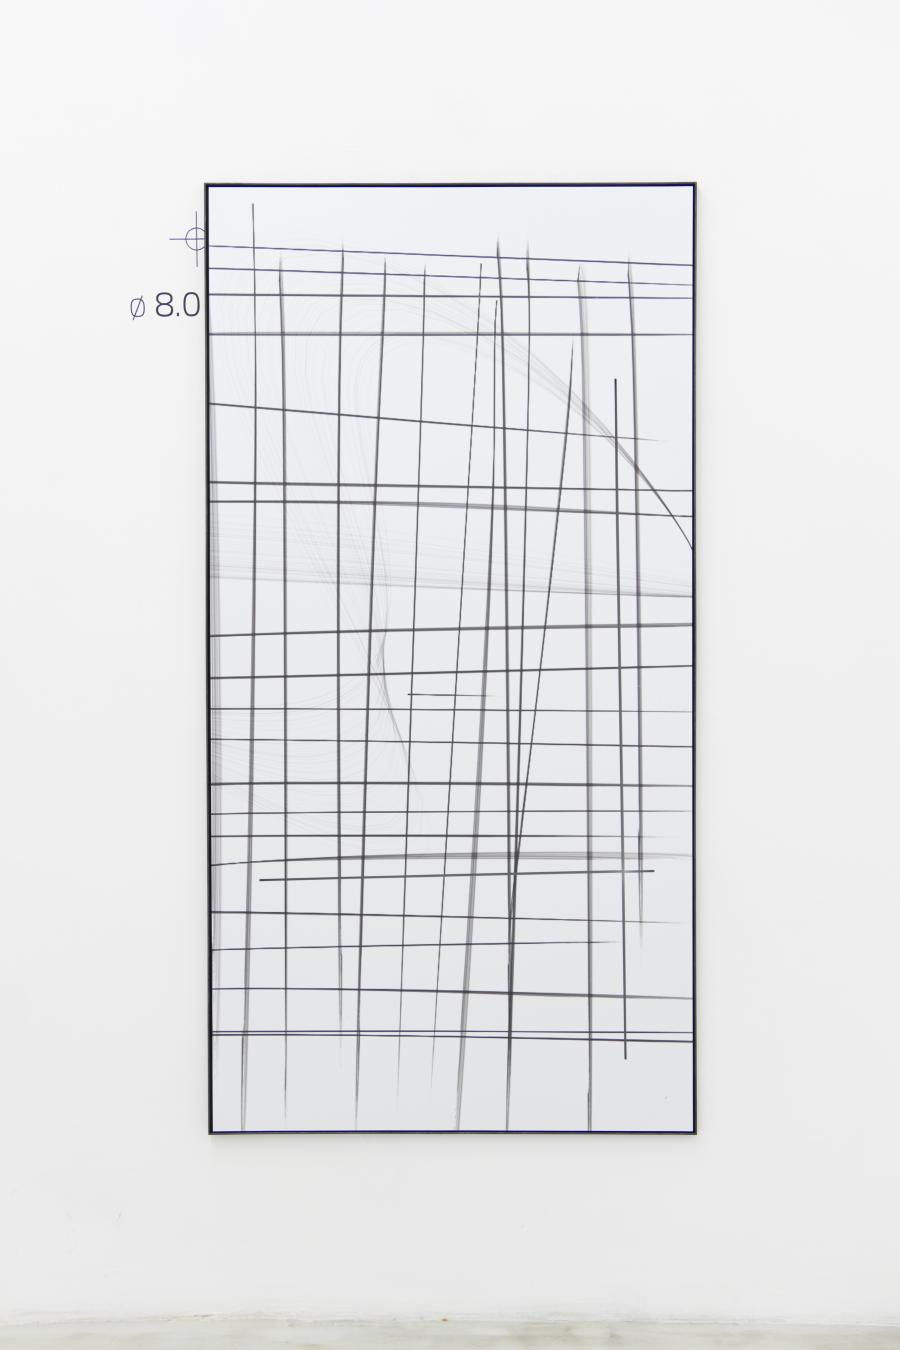 Marina Sula, Drawing - office, tablet drawing, UV-print on Dibond, laser cut, steel, 172 x 89, 2015